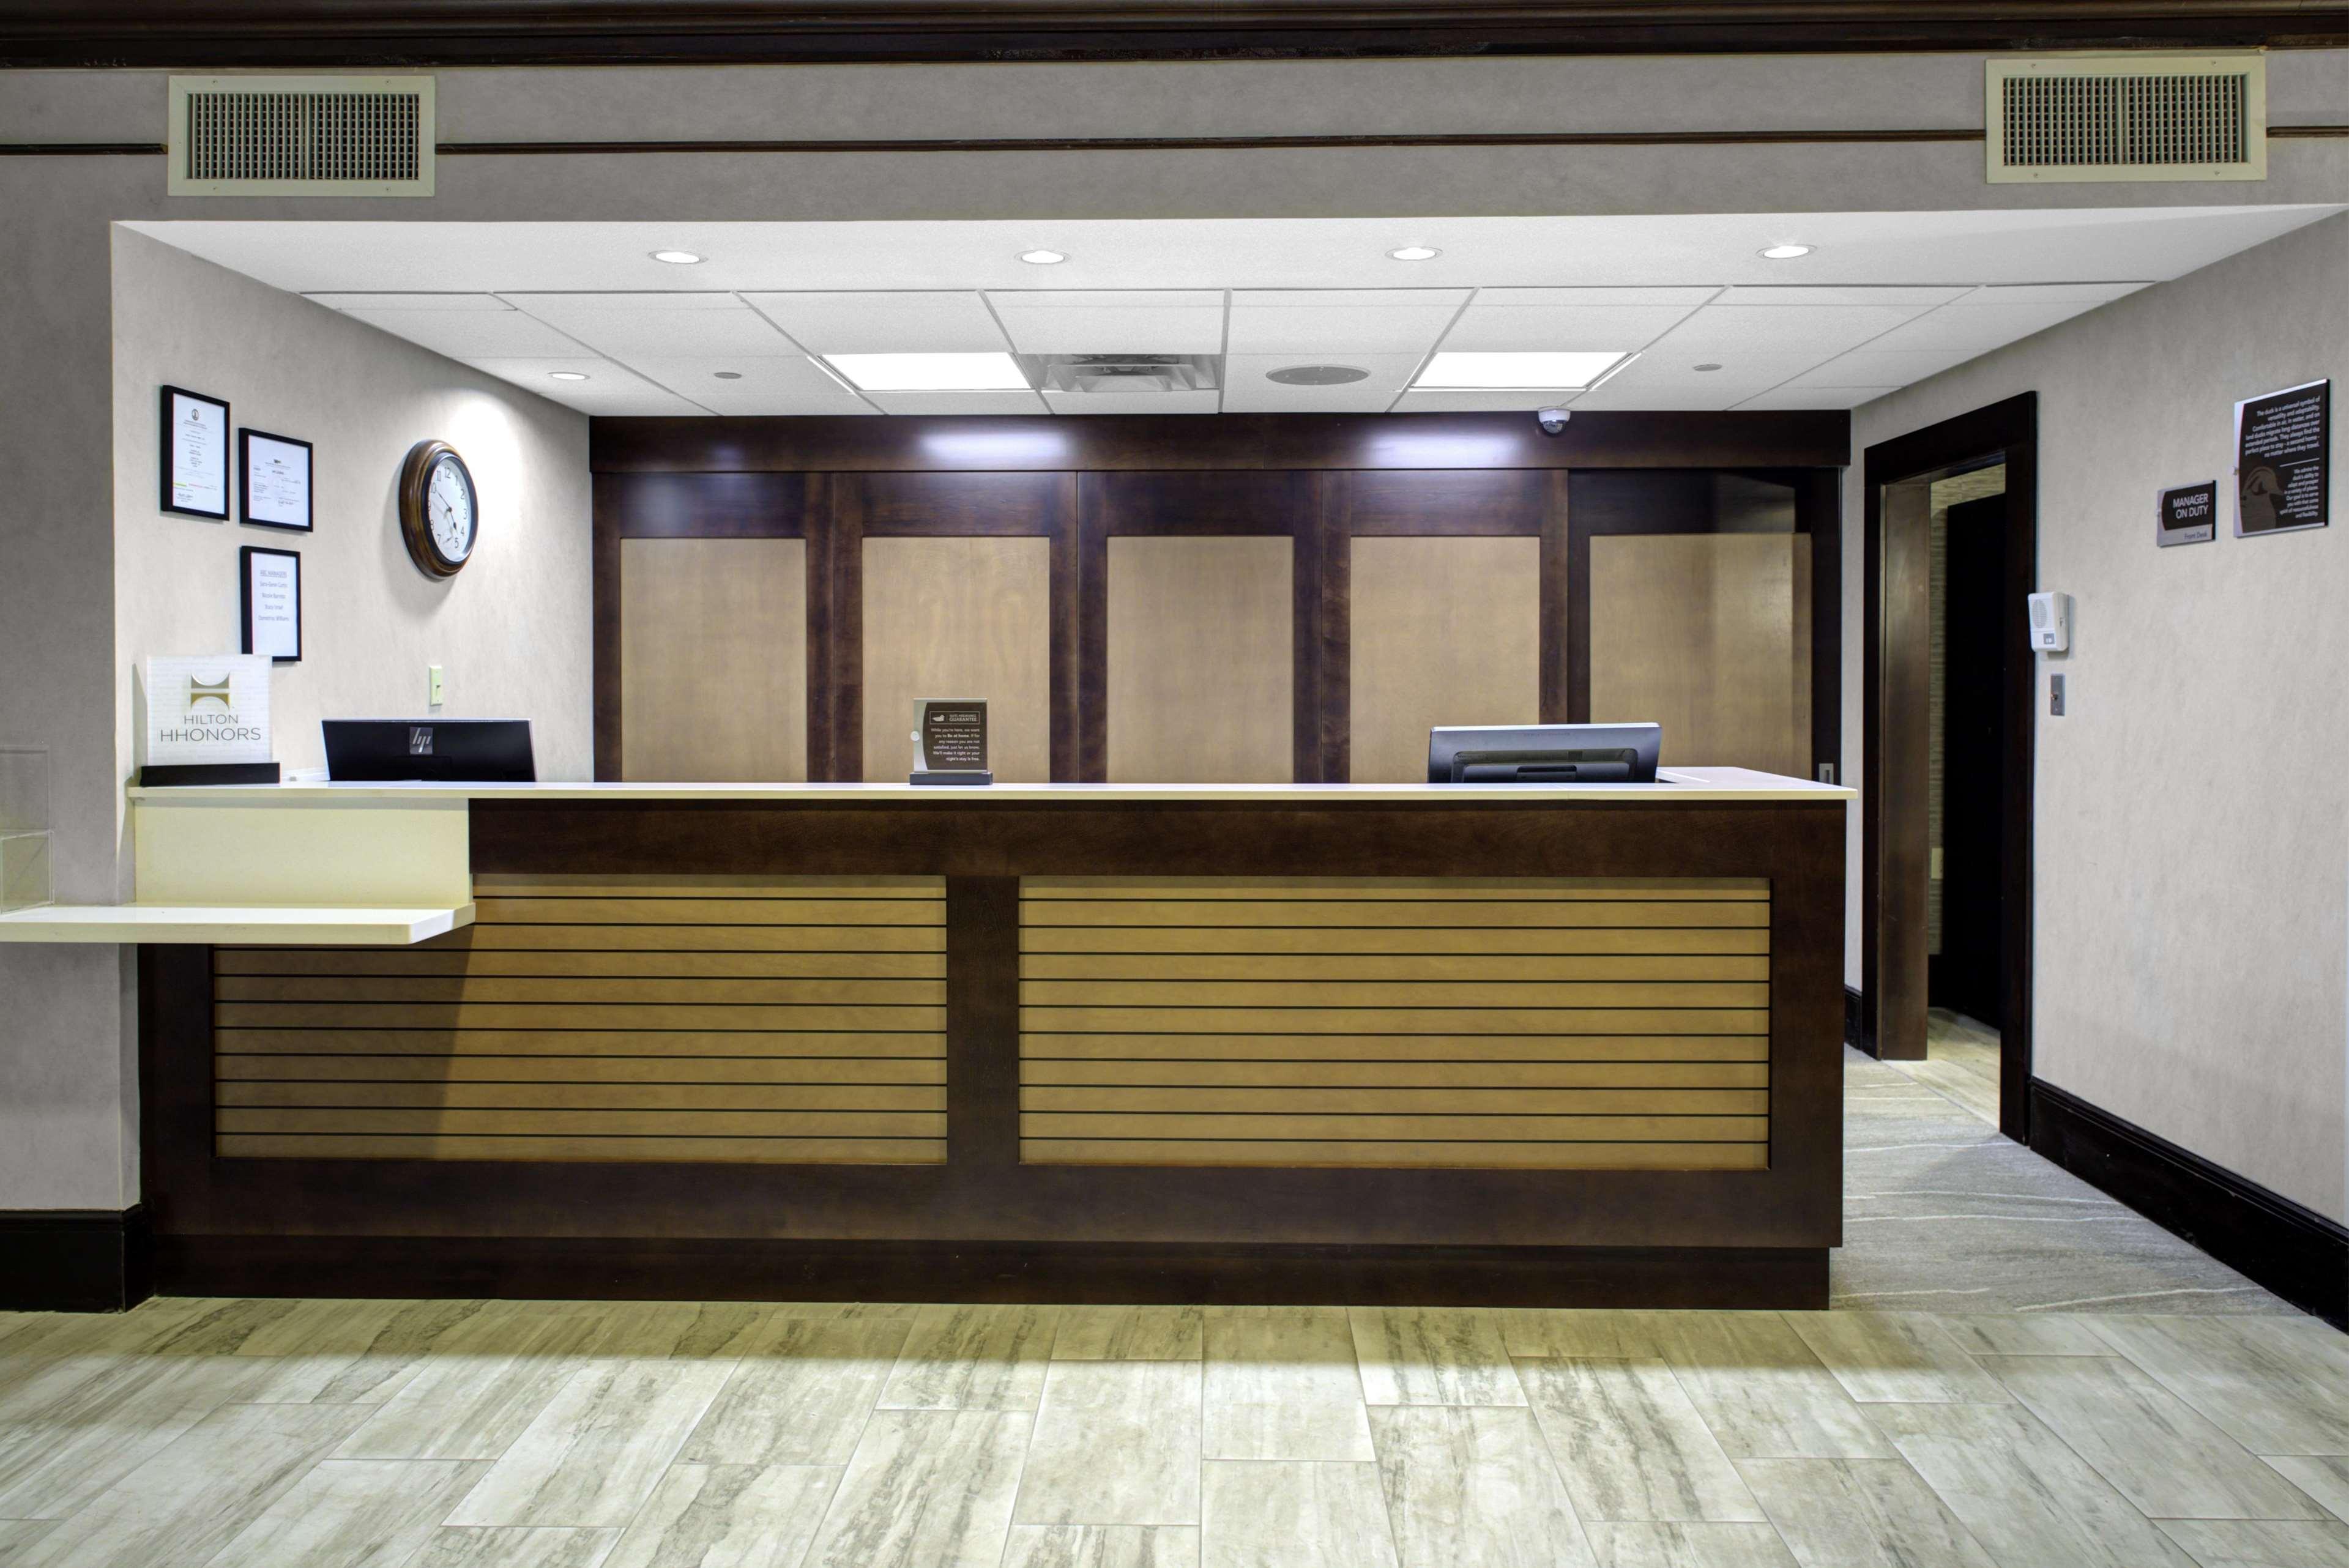 Homewood Suites by Hilton Richmond-Chester - Chester, VA 23836 - (804)751-0010   ShowMeLocal.com